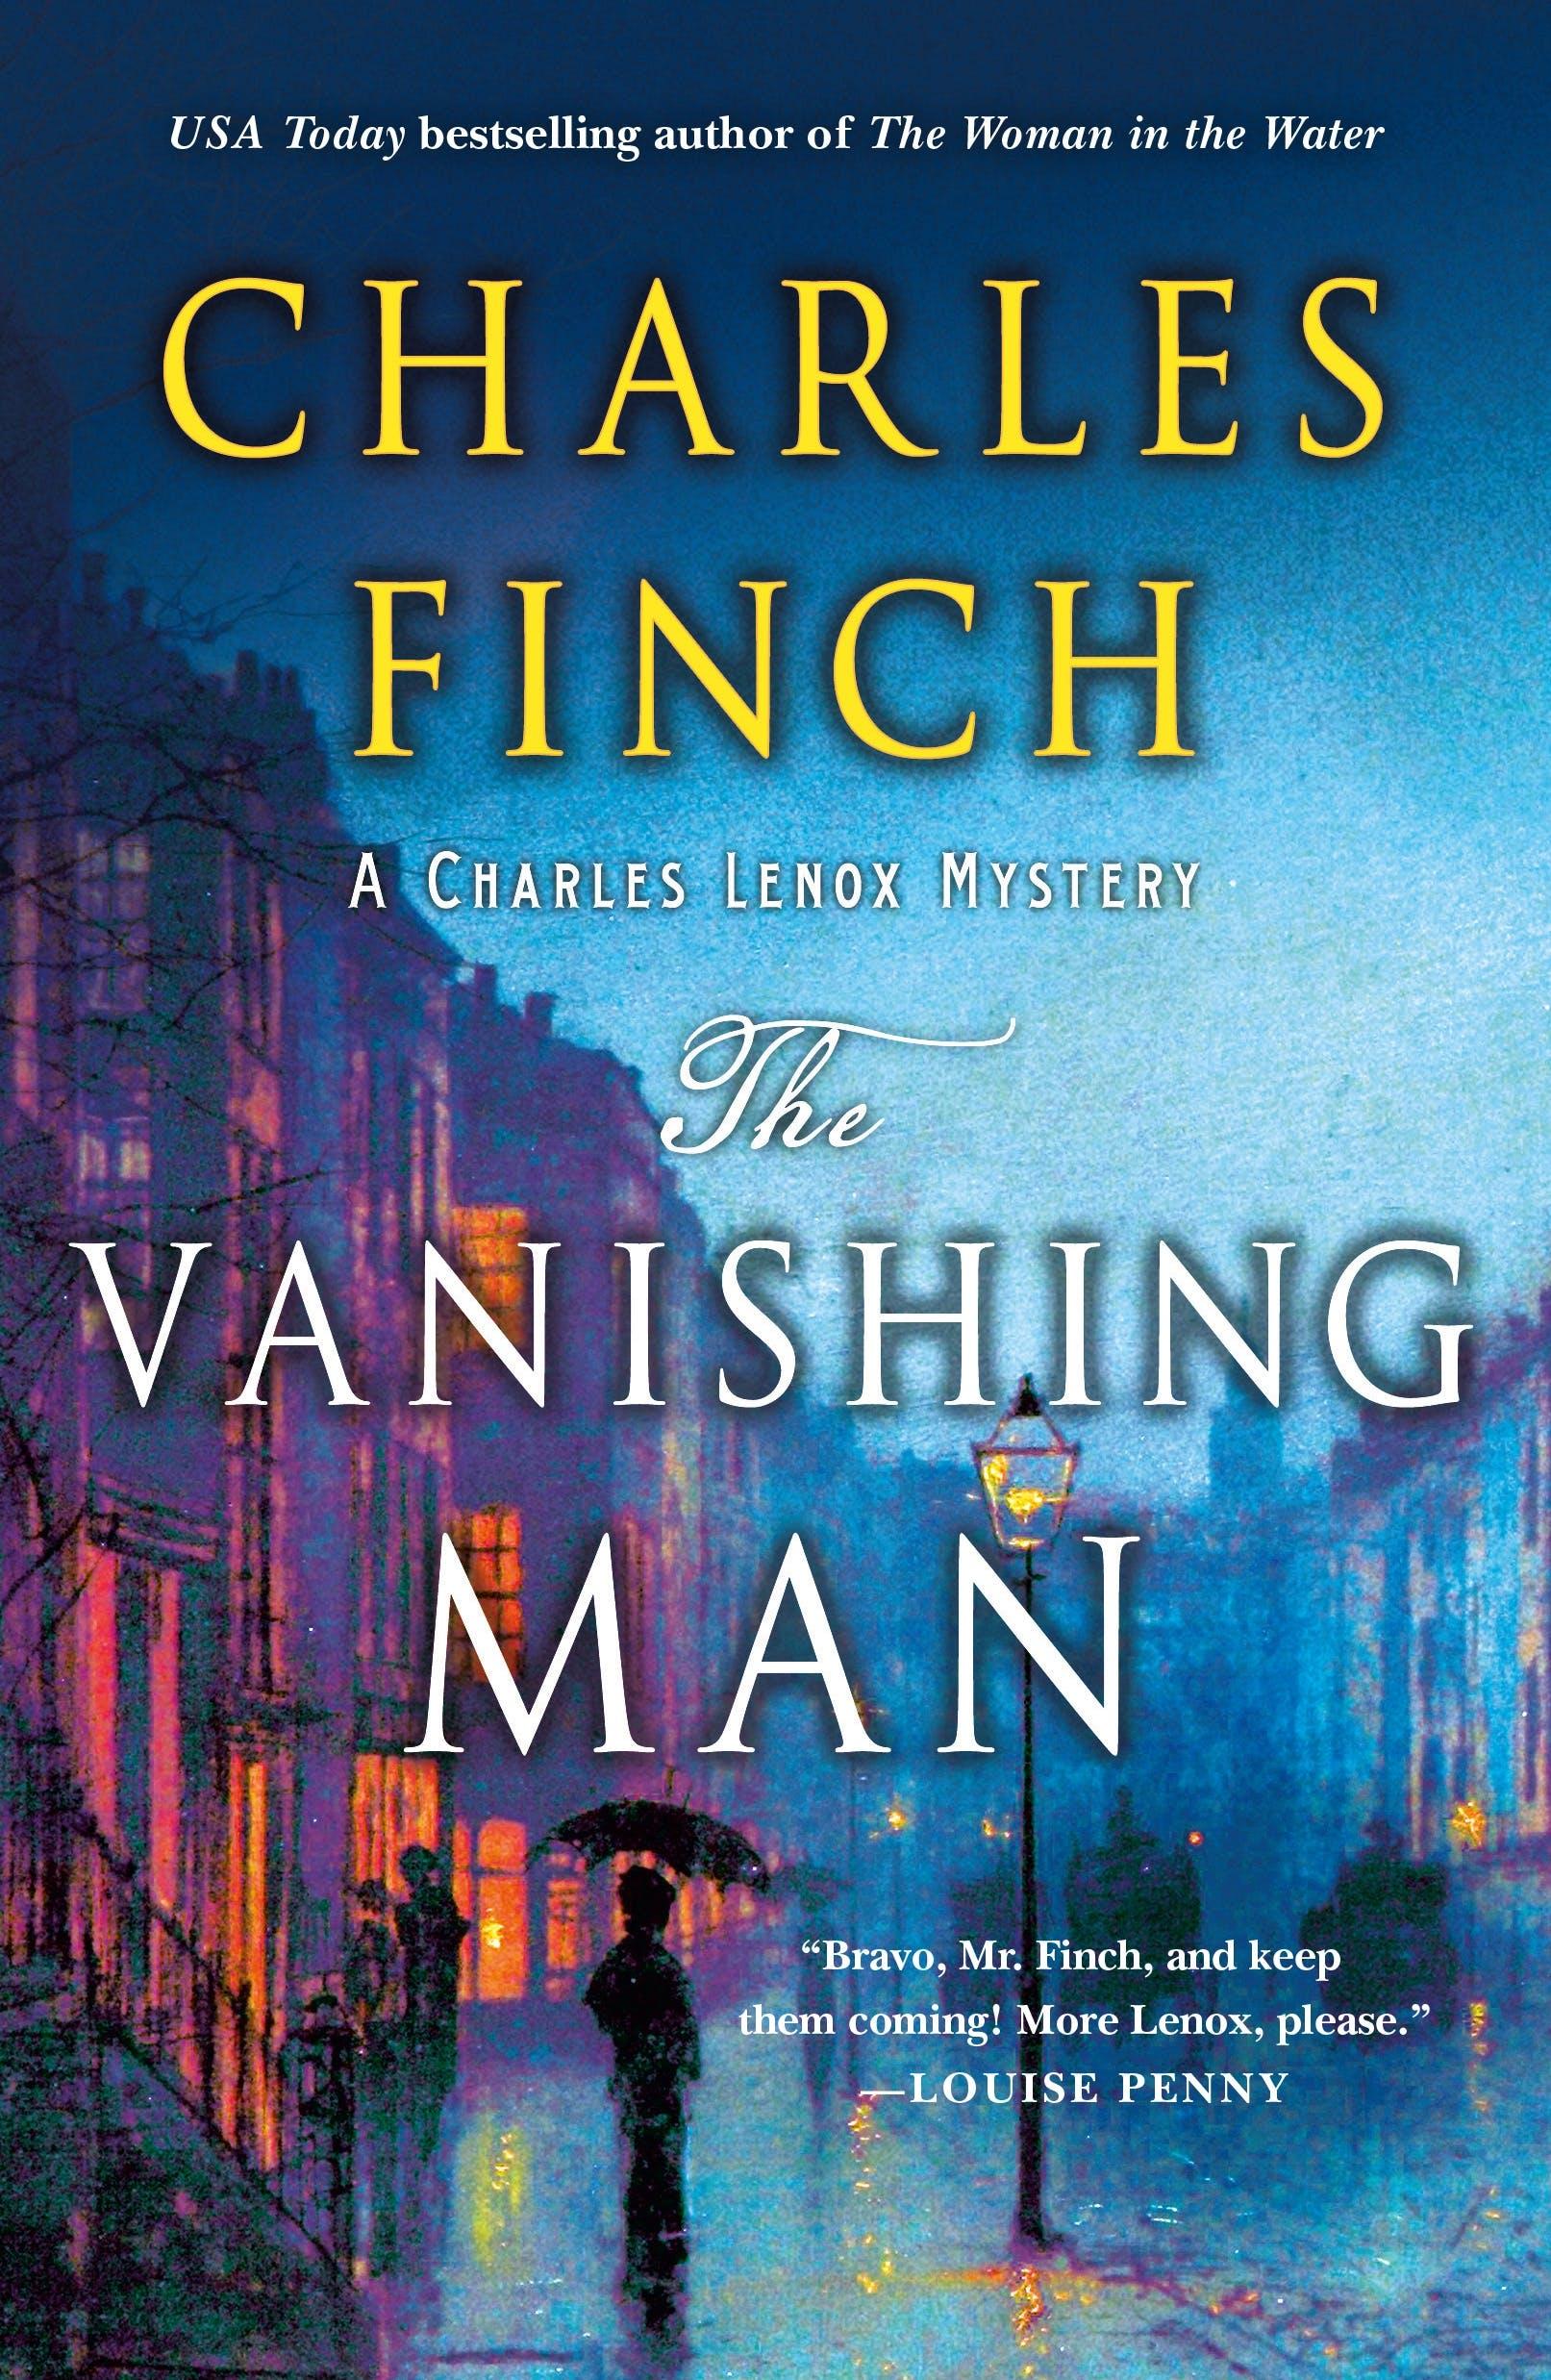 Image of The Vanishing Man